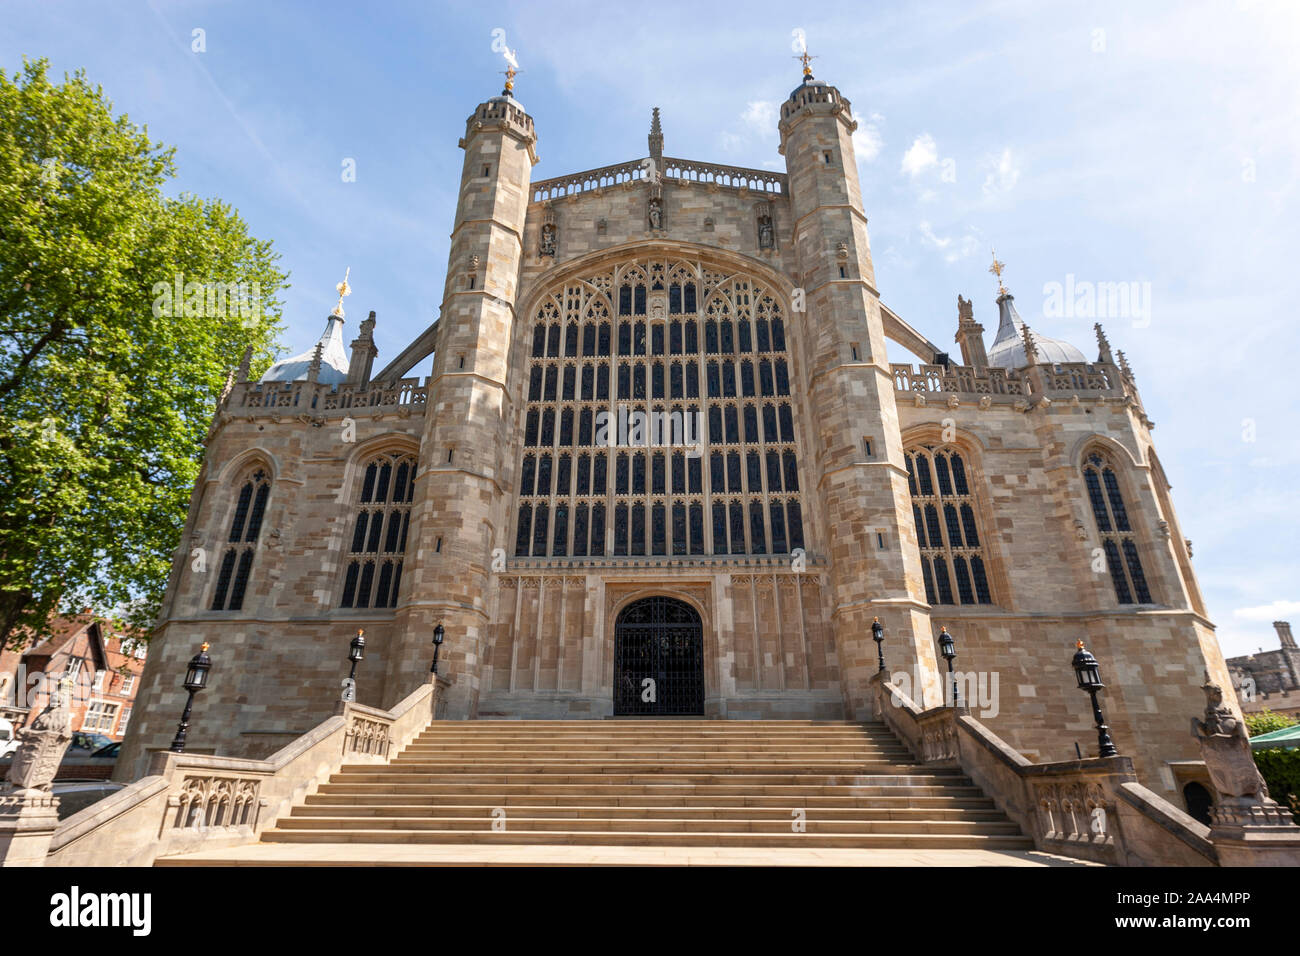 st-georges-chapel-windsor-castle-gothic-